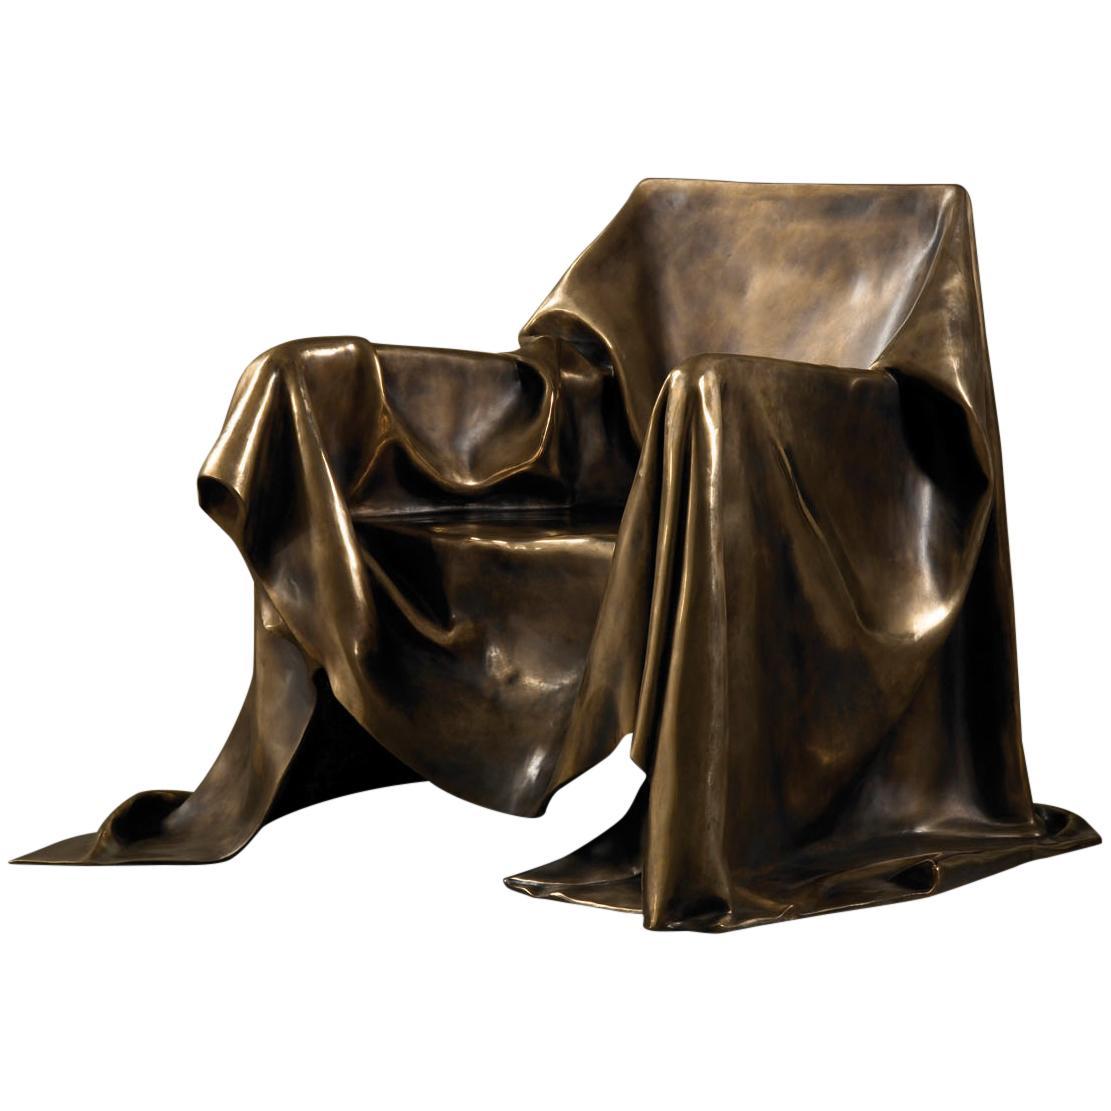 Modern Andrea Salvetti for Dilmos Limited EditionArmchair Sculpture Bronze Cast